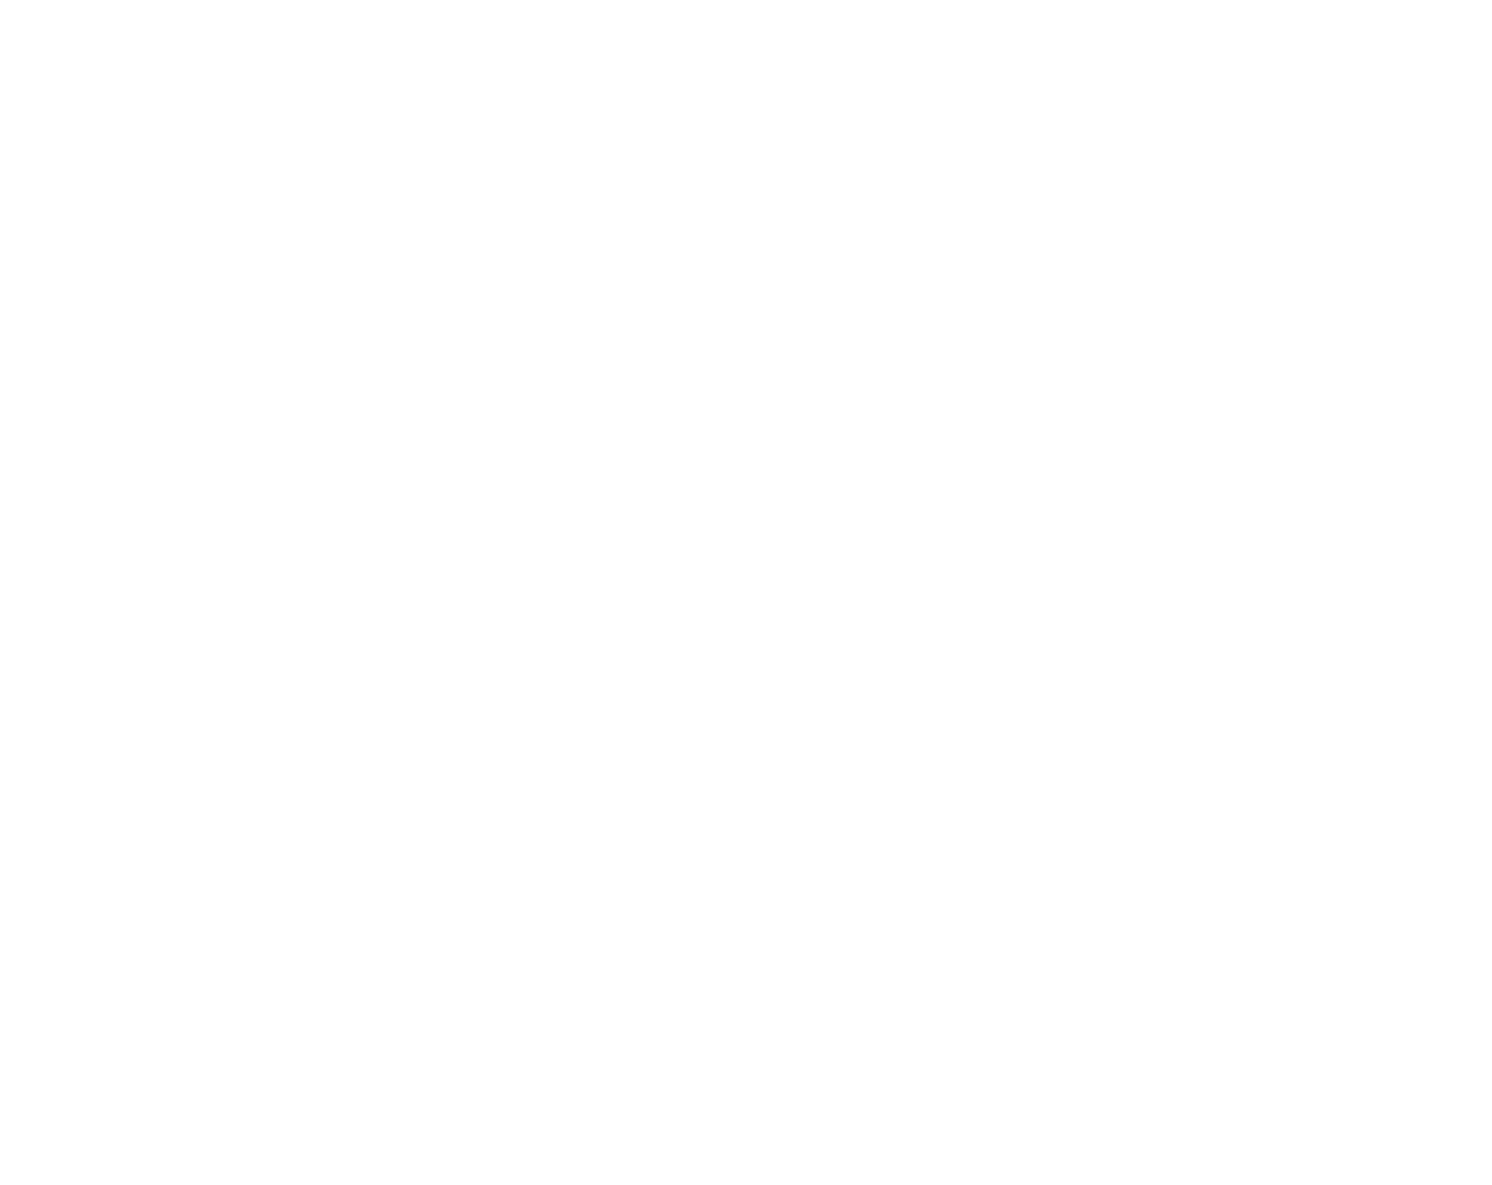 Logo de Getasound en version blanche